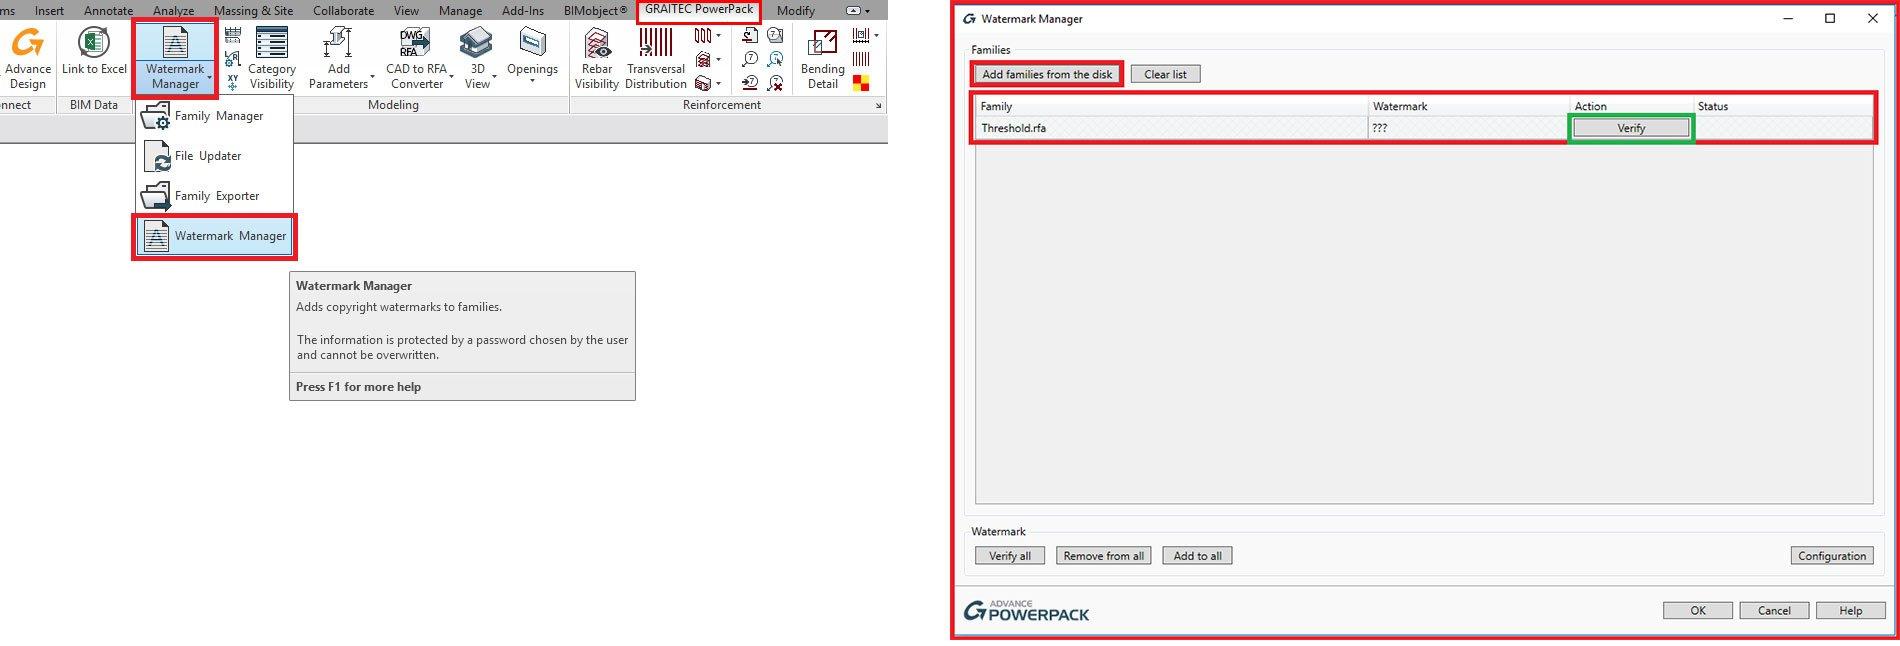 GRAITEC PowerPack pentru Autodesk® Revit | Watermark Manager